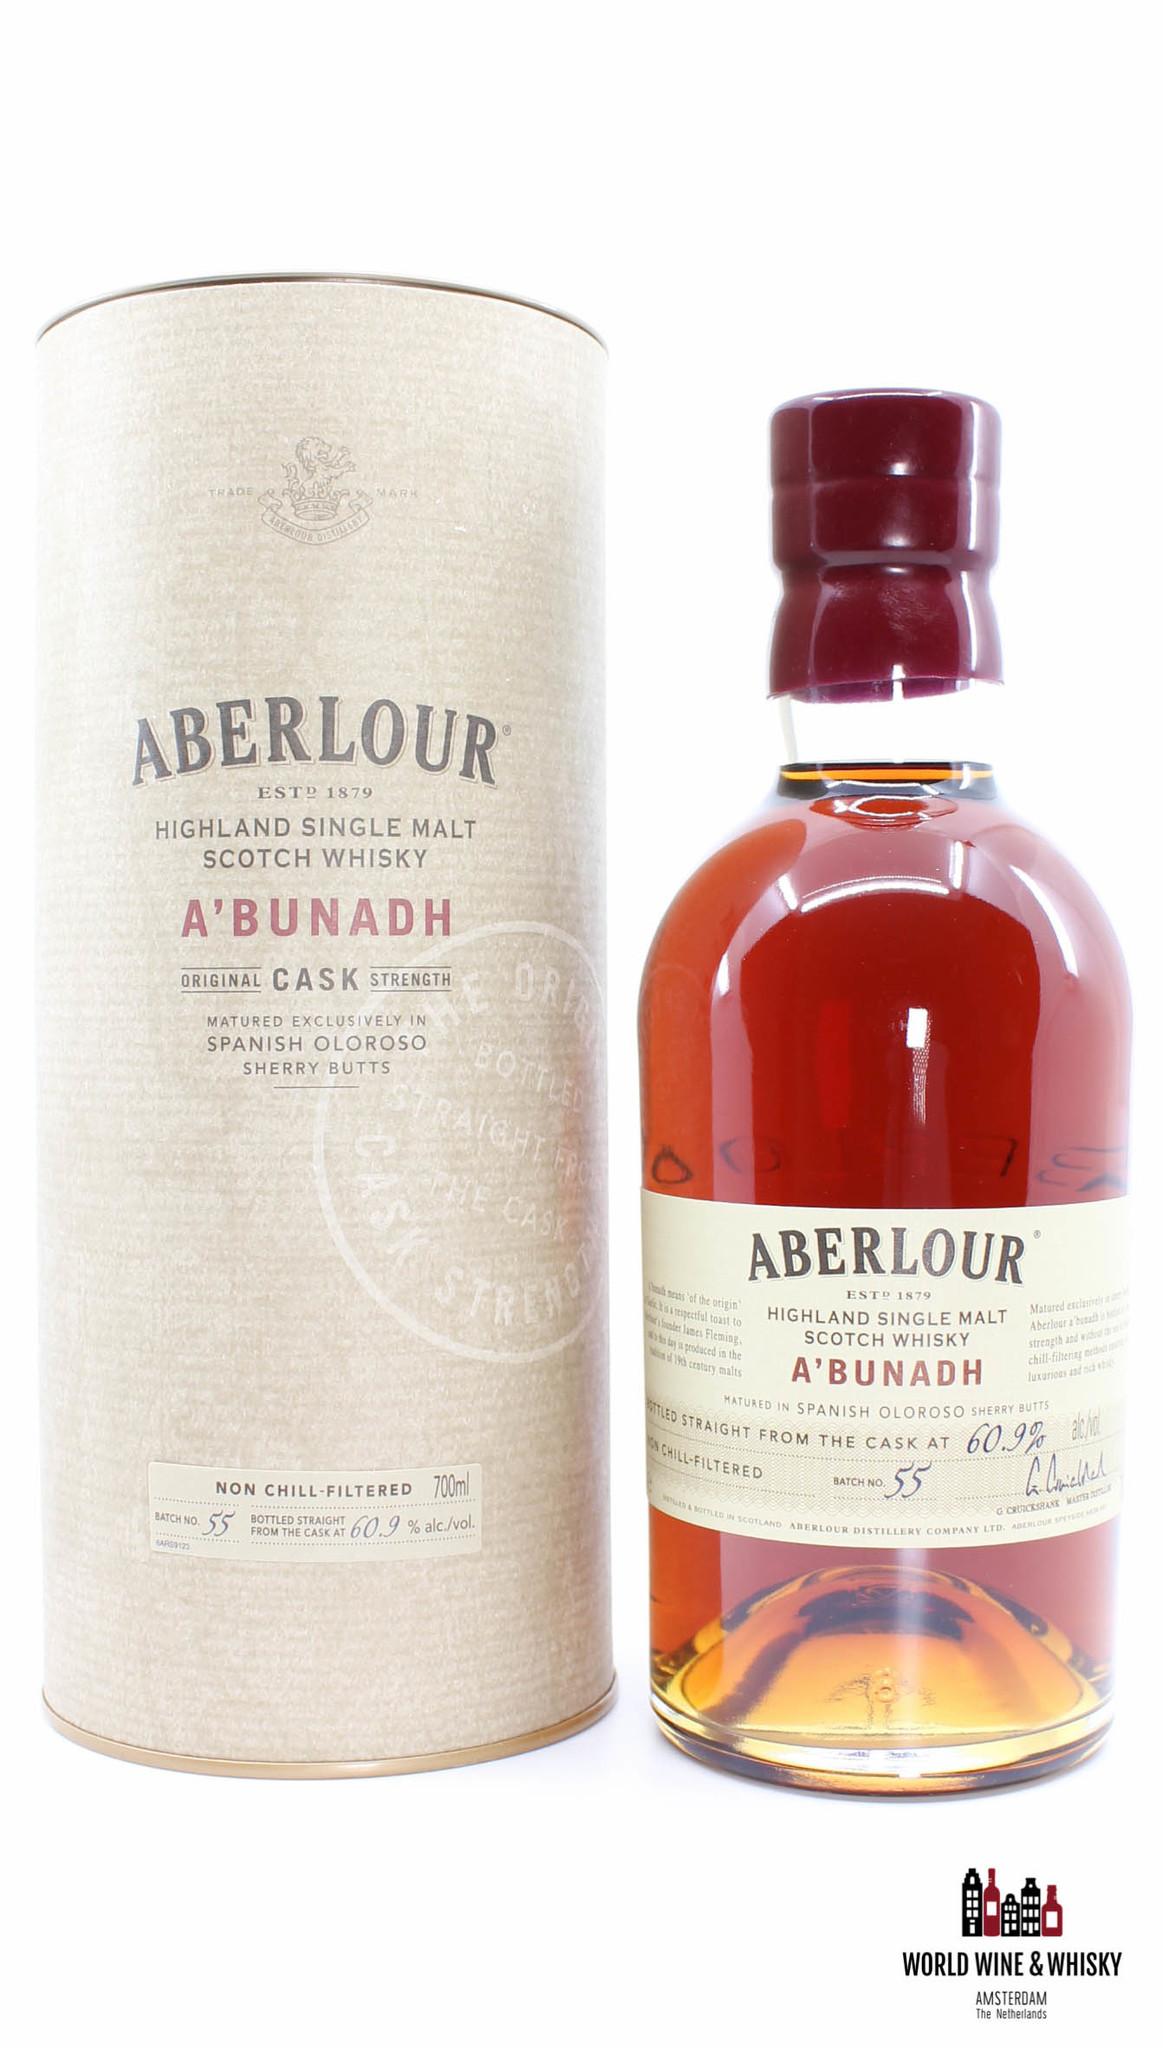 Aberlour Aberlour 2016 A'bunadh - Batch No. 55 - Spanish Oloroso Sherry 60.9%